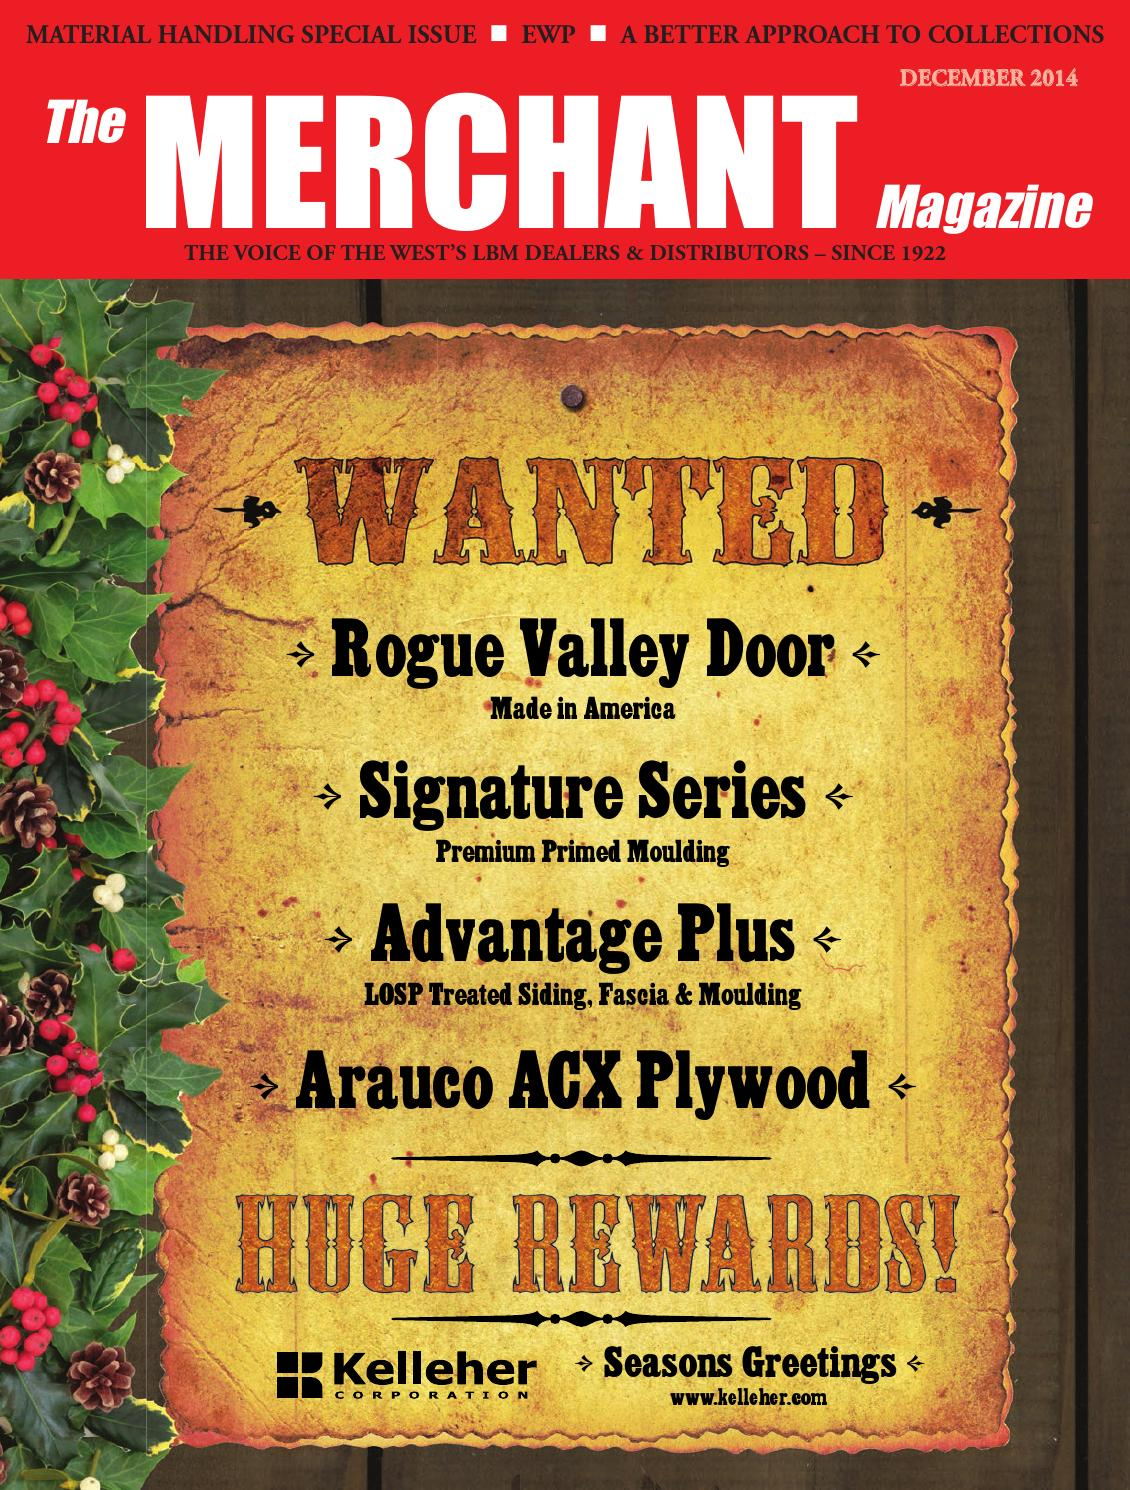 Merchant Dec 2014 By 526 Media Group Issuu